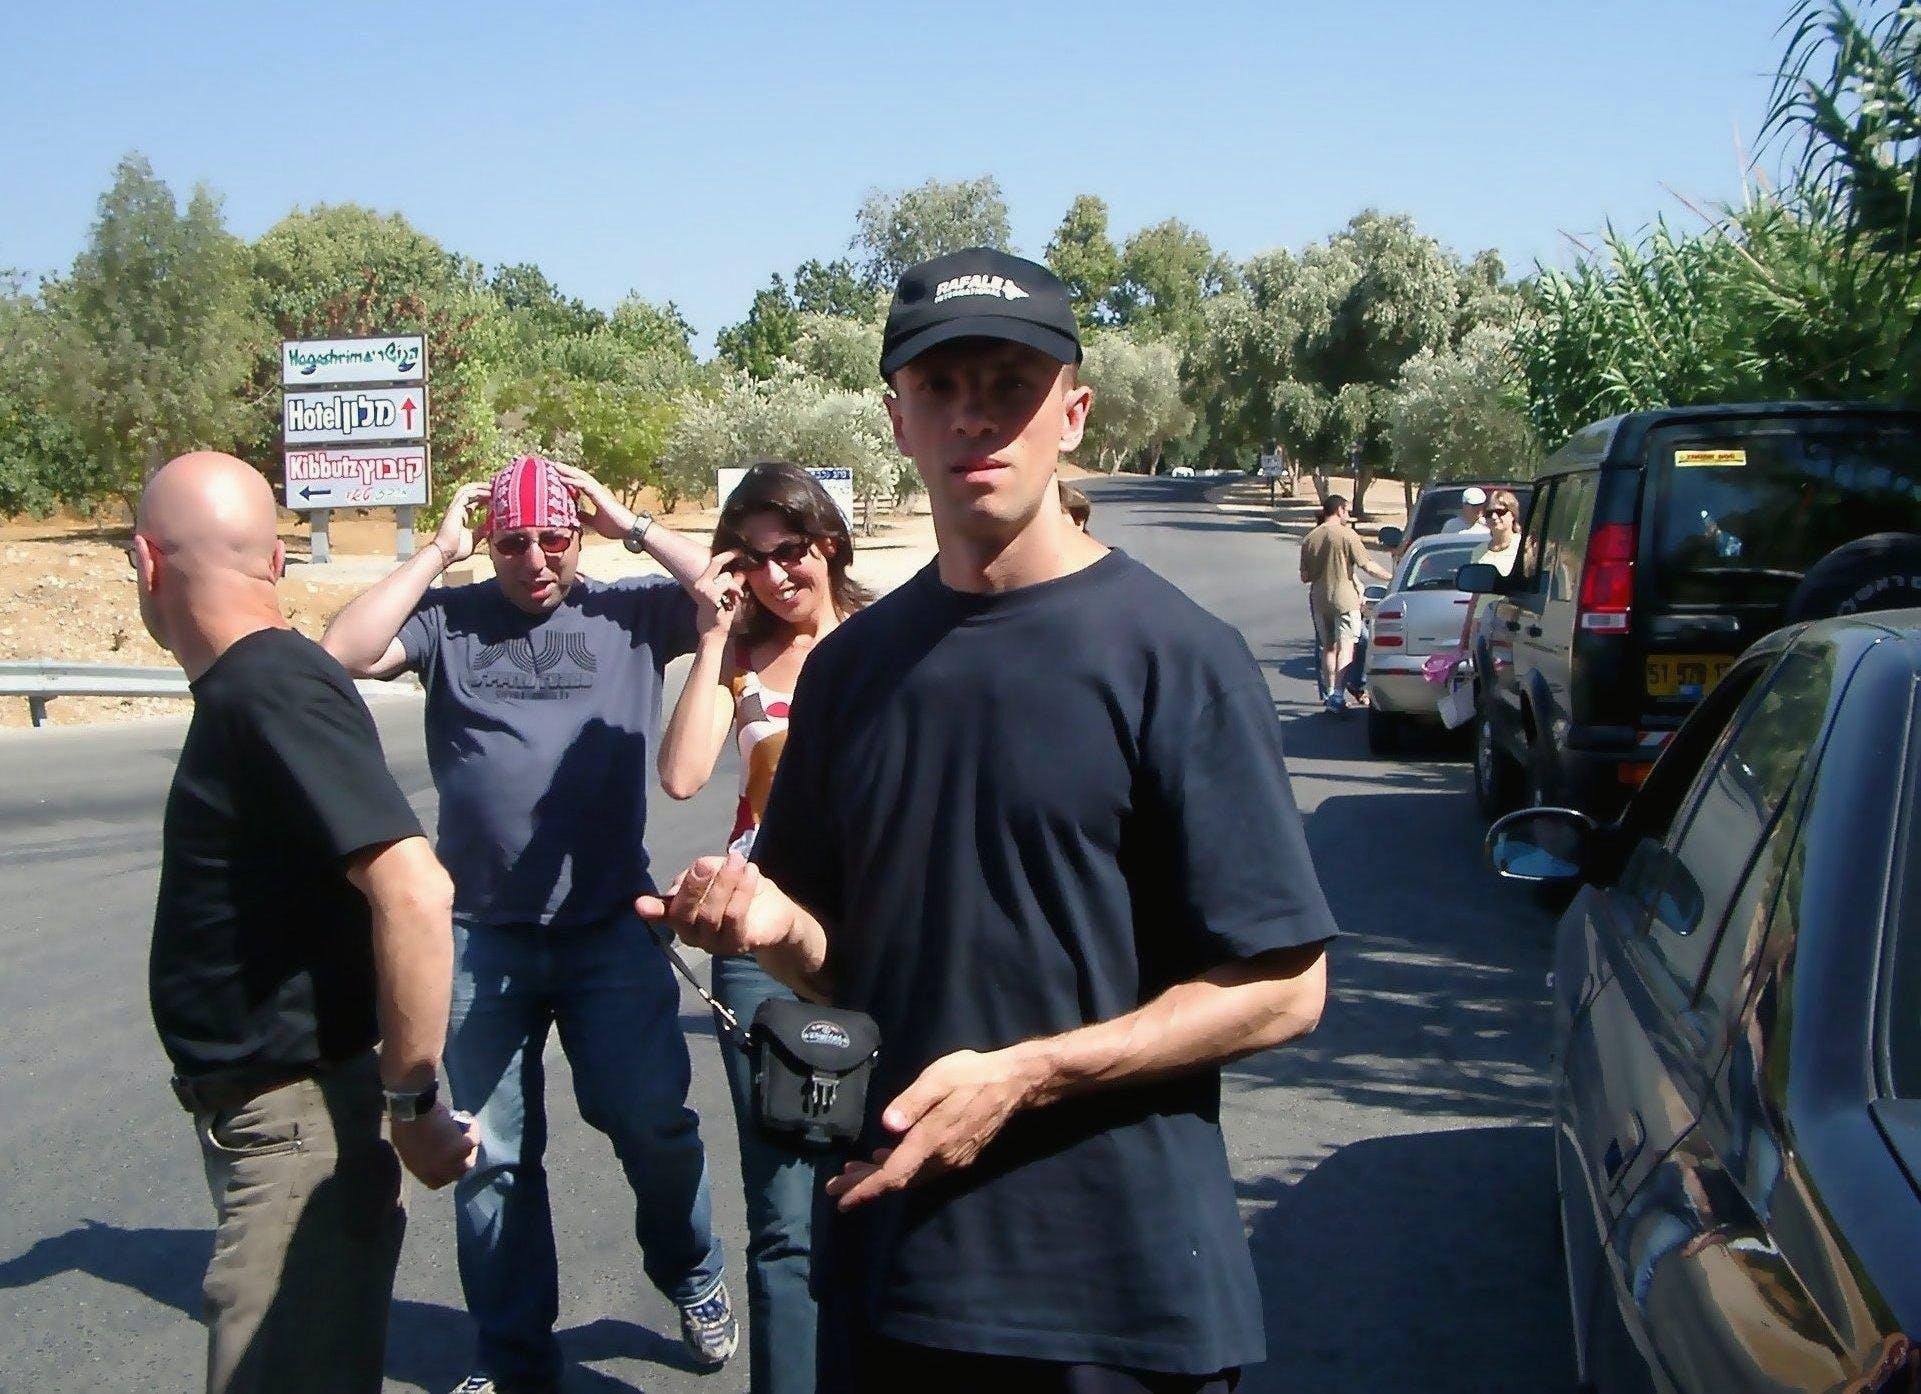 Free stock photo of Israel, Qiryat Šmona, Kiryat Shmona